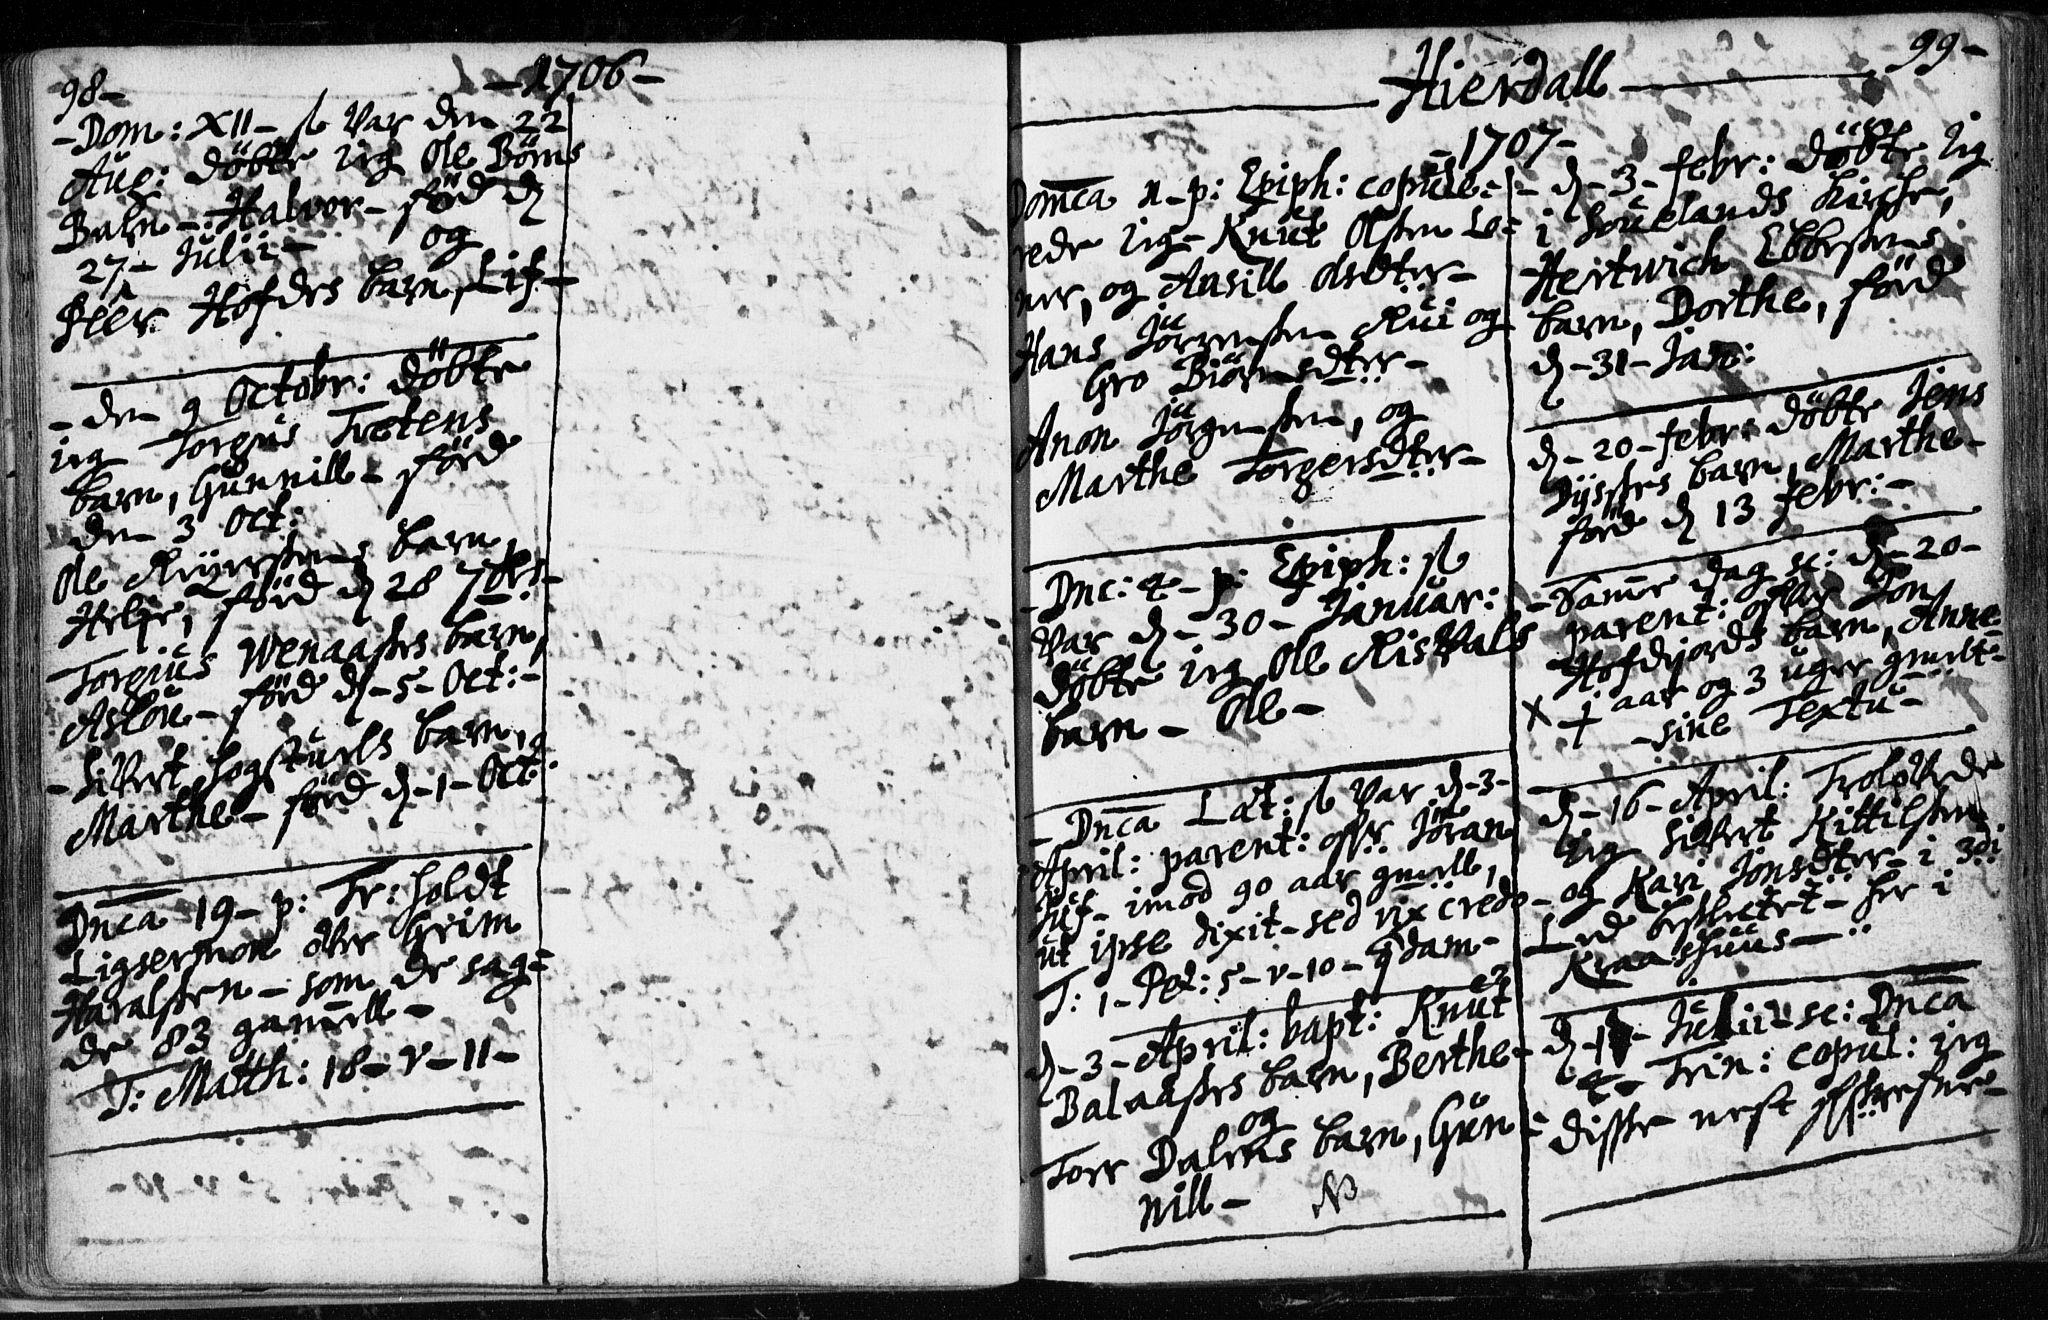 SAKO, Hjartdal kirkebøker, F/Fa/L0001: Ministerialbok nr. I 1, 1685-1714, s. 98-99